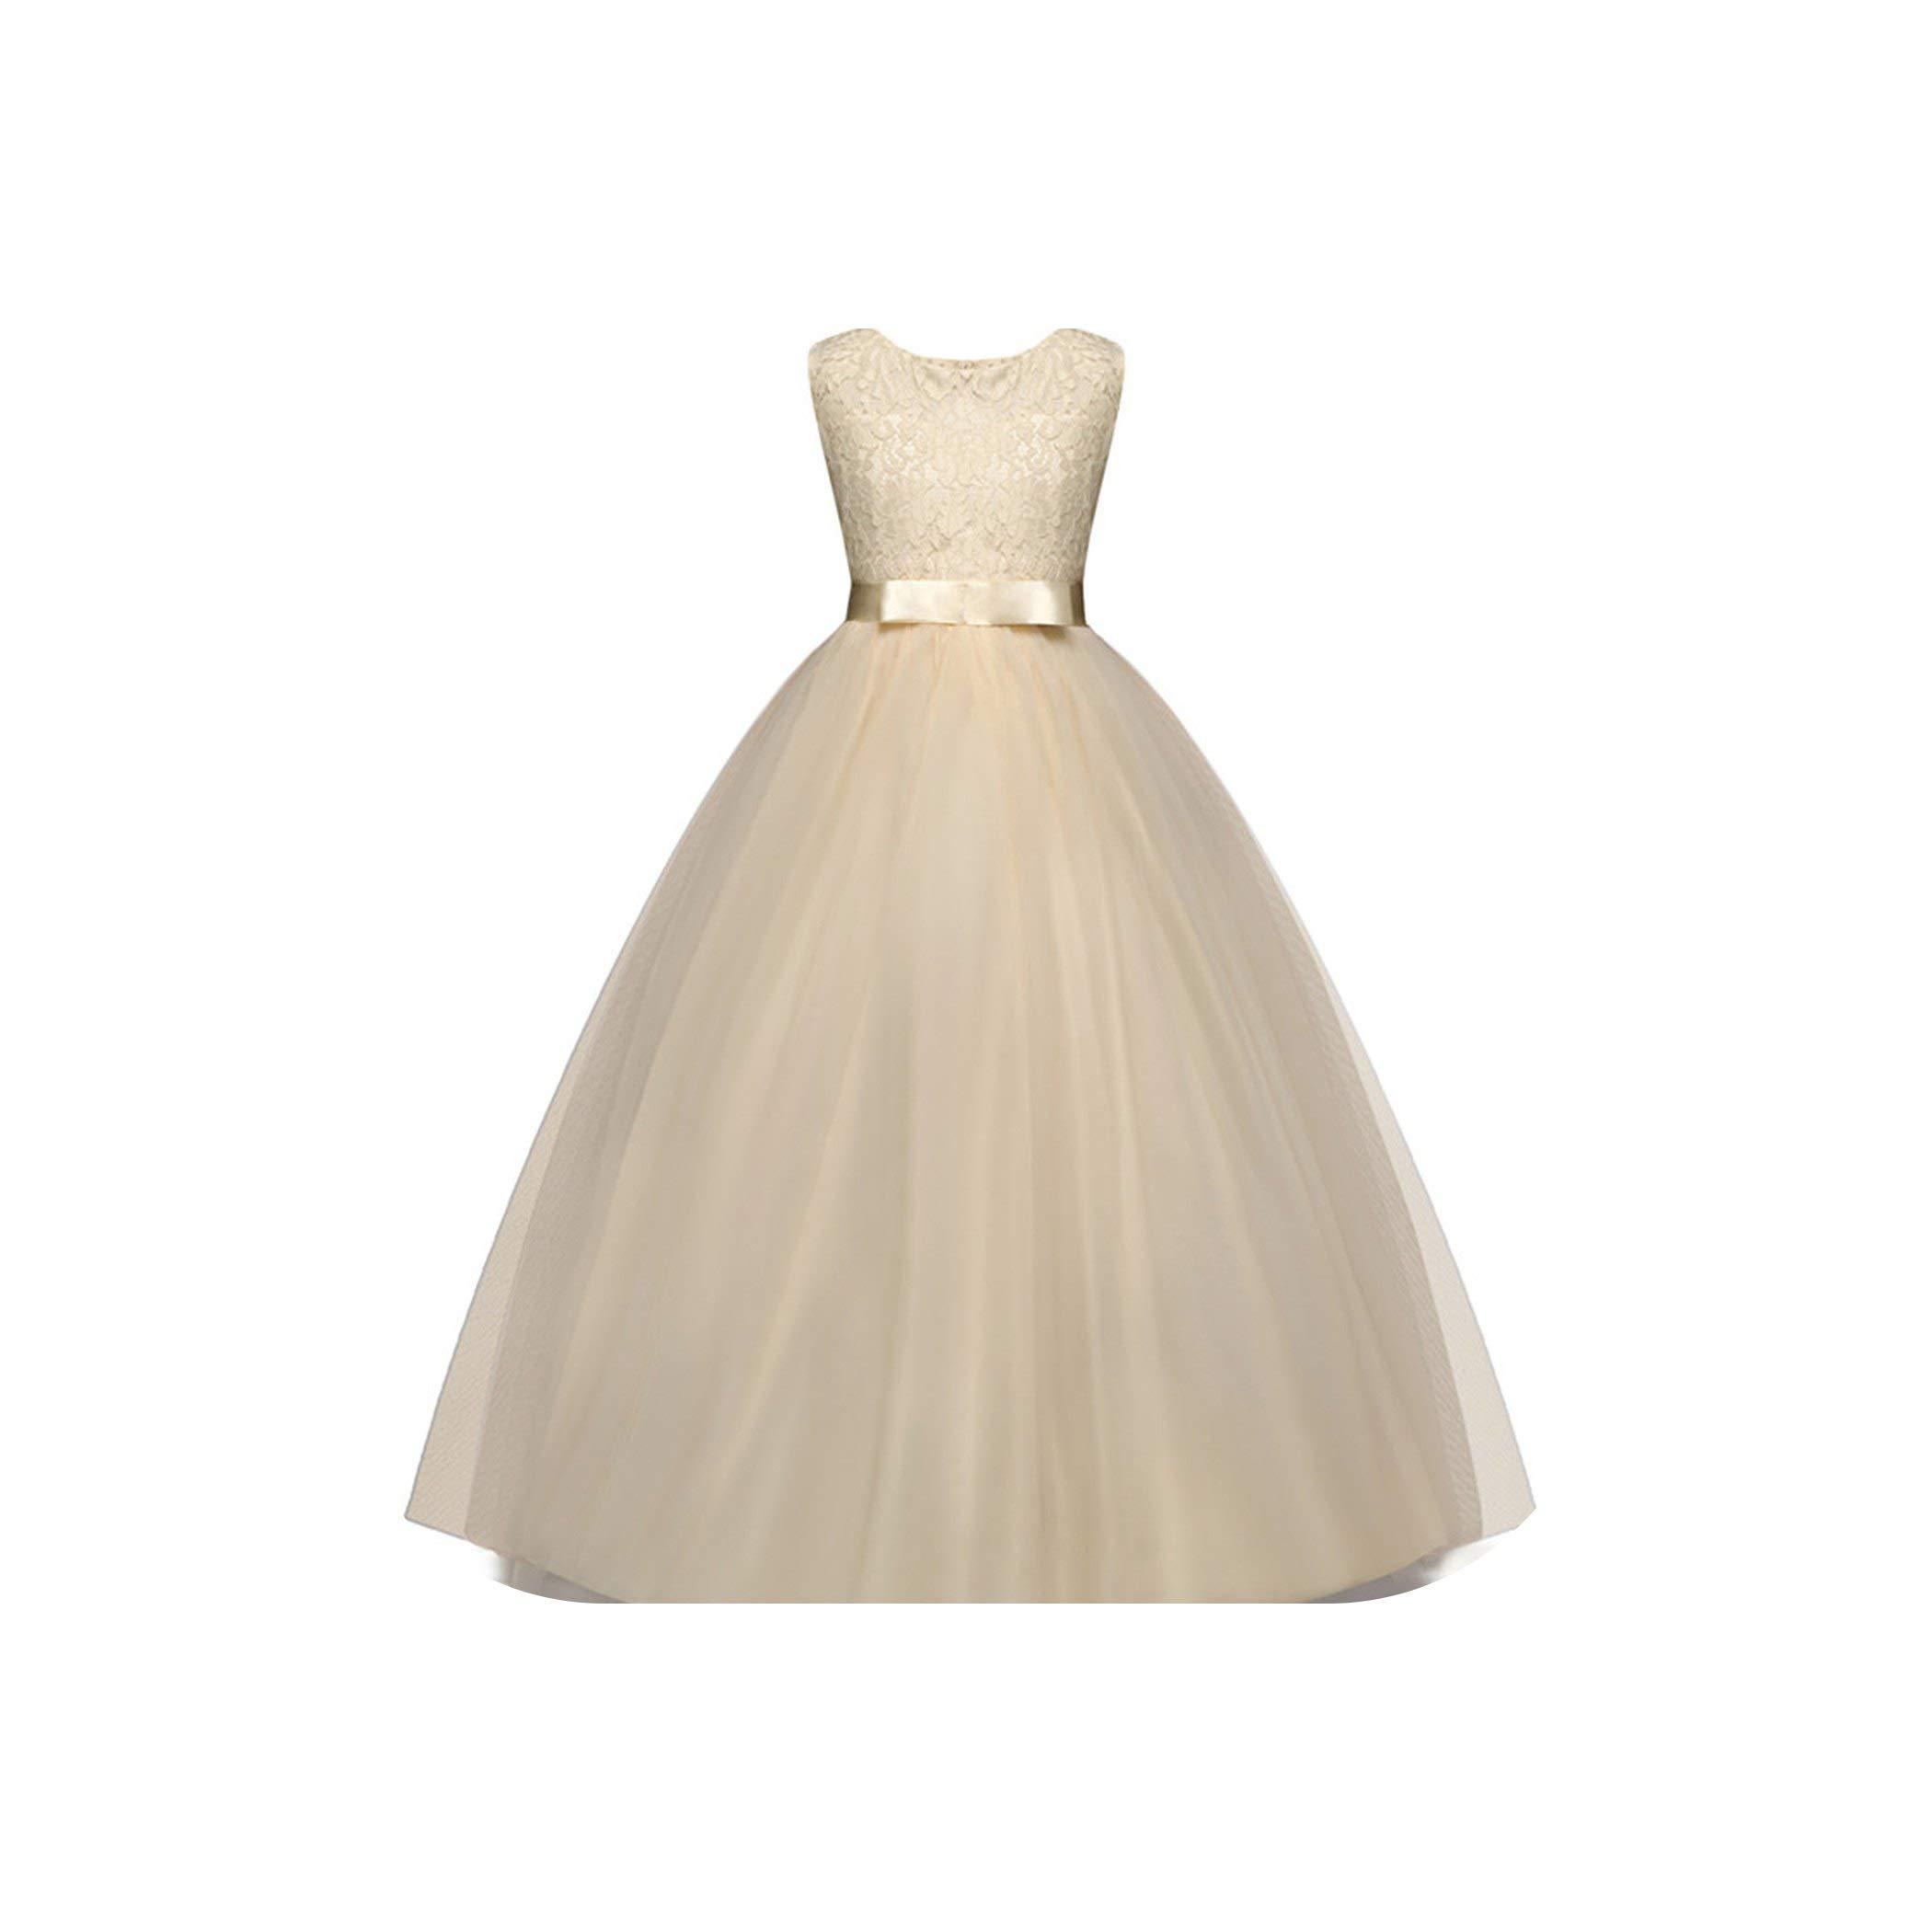 New Kids Girls Wedding Flower Girl Dress Princess Party Pageant Formal Costume Sleeveless Dresses,he is,5